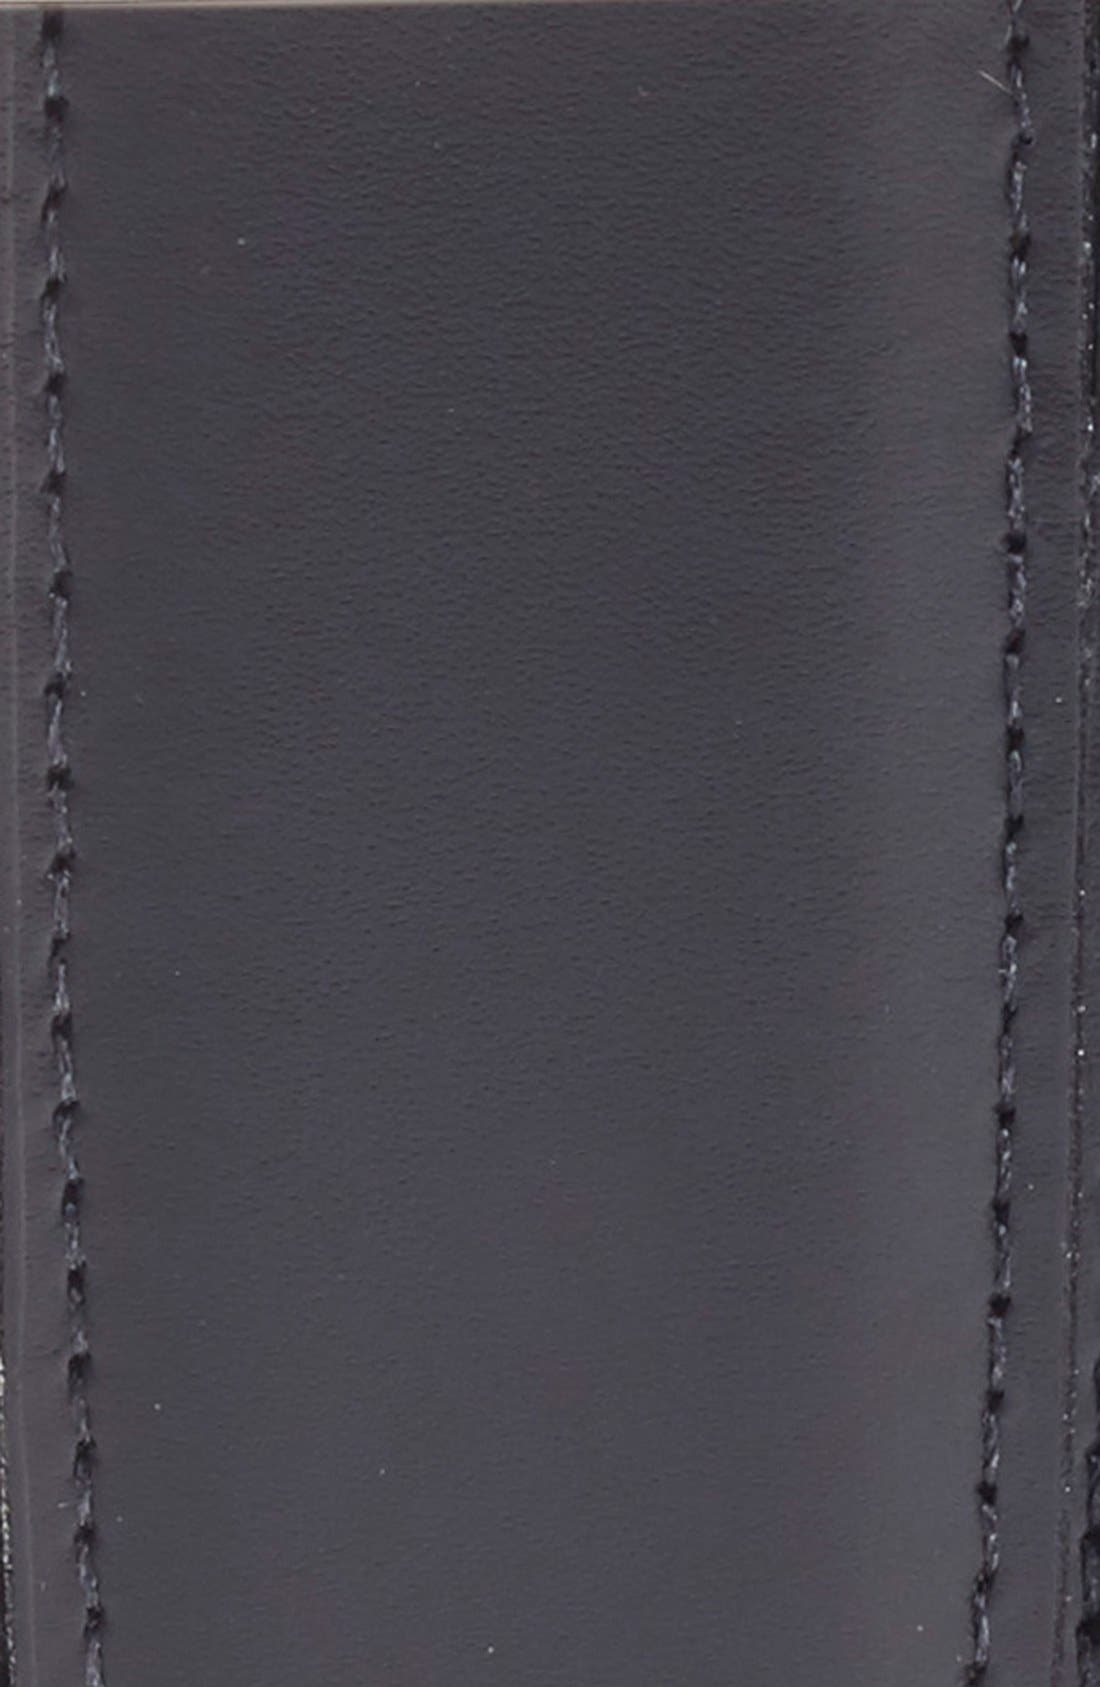 Alternate Image 3  - Torino Belts Reversible Leather Belt